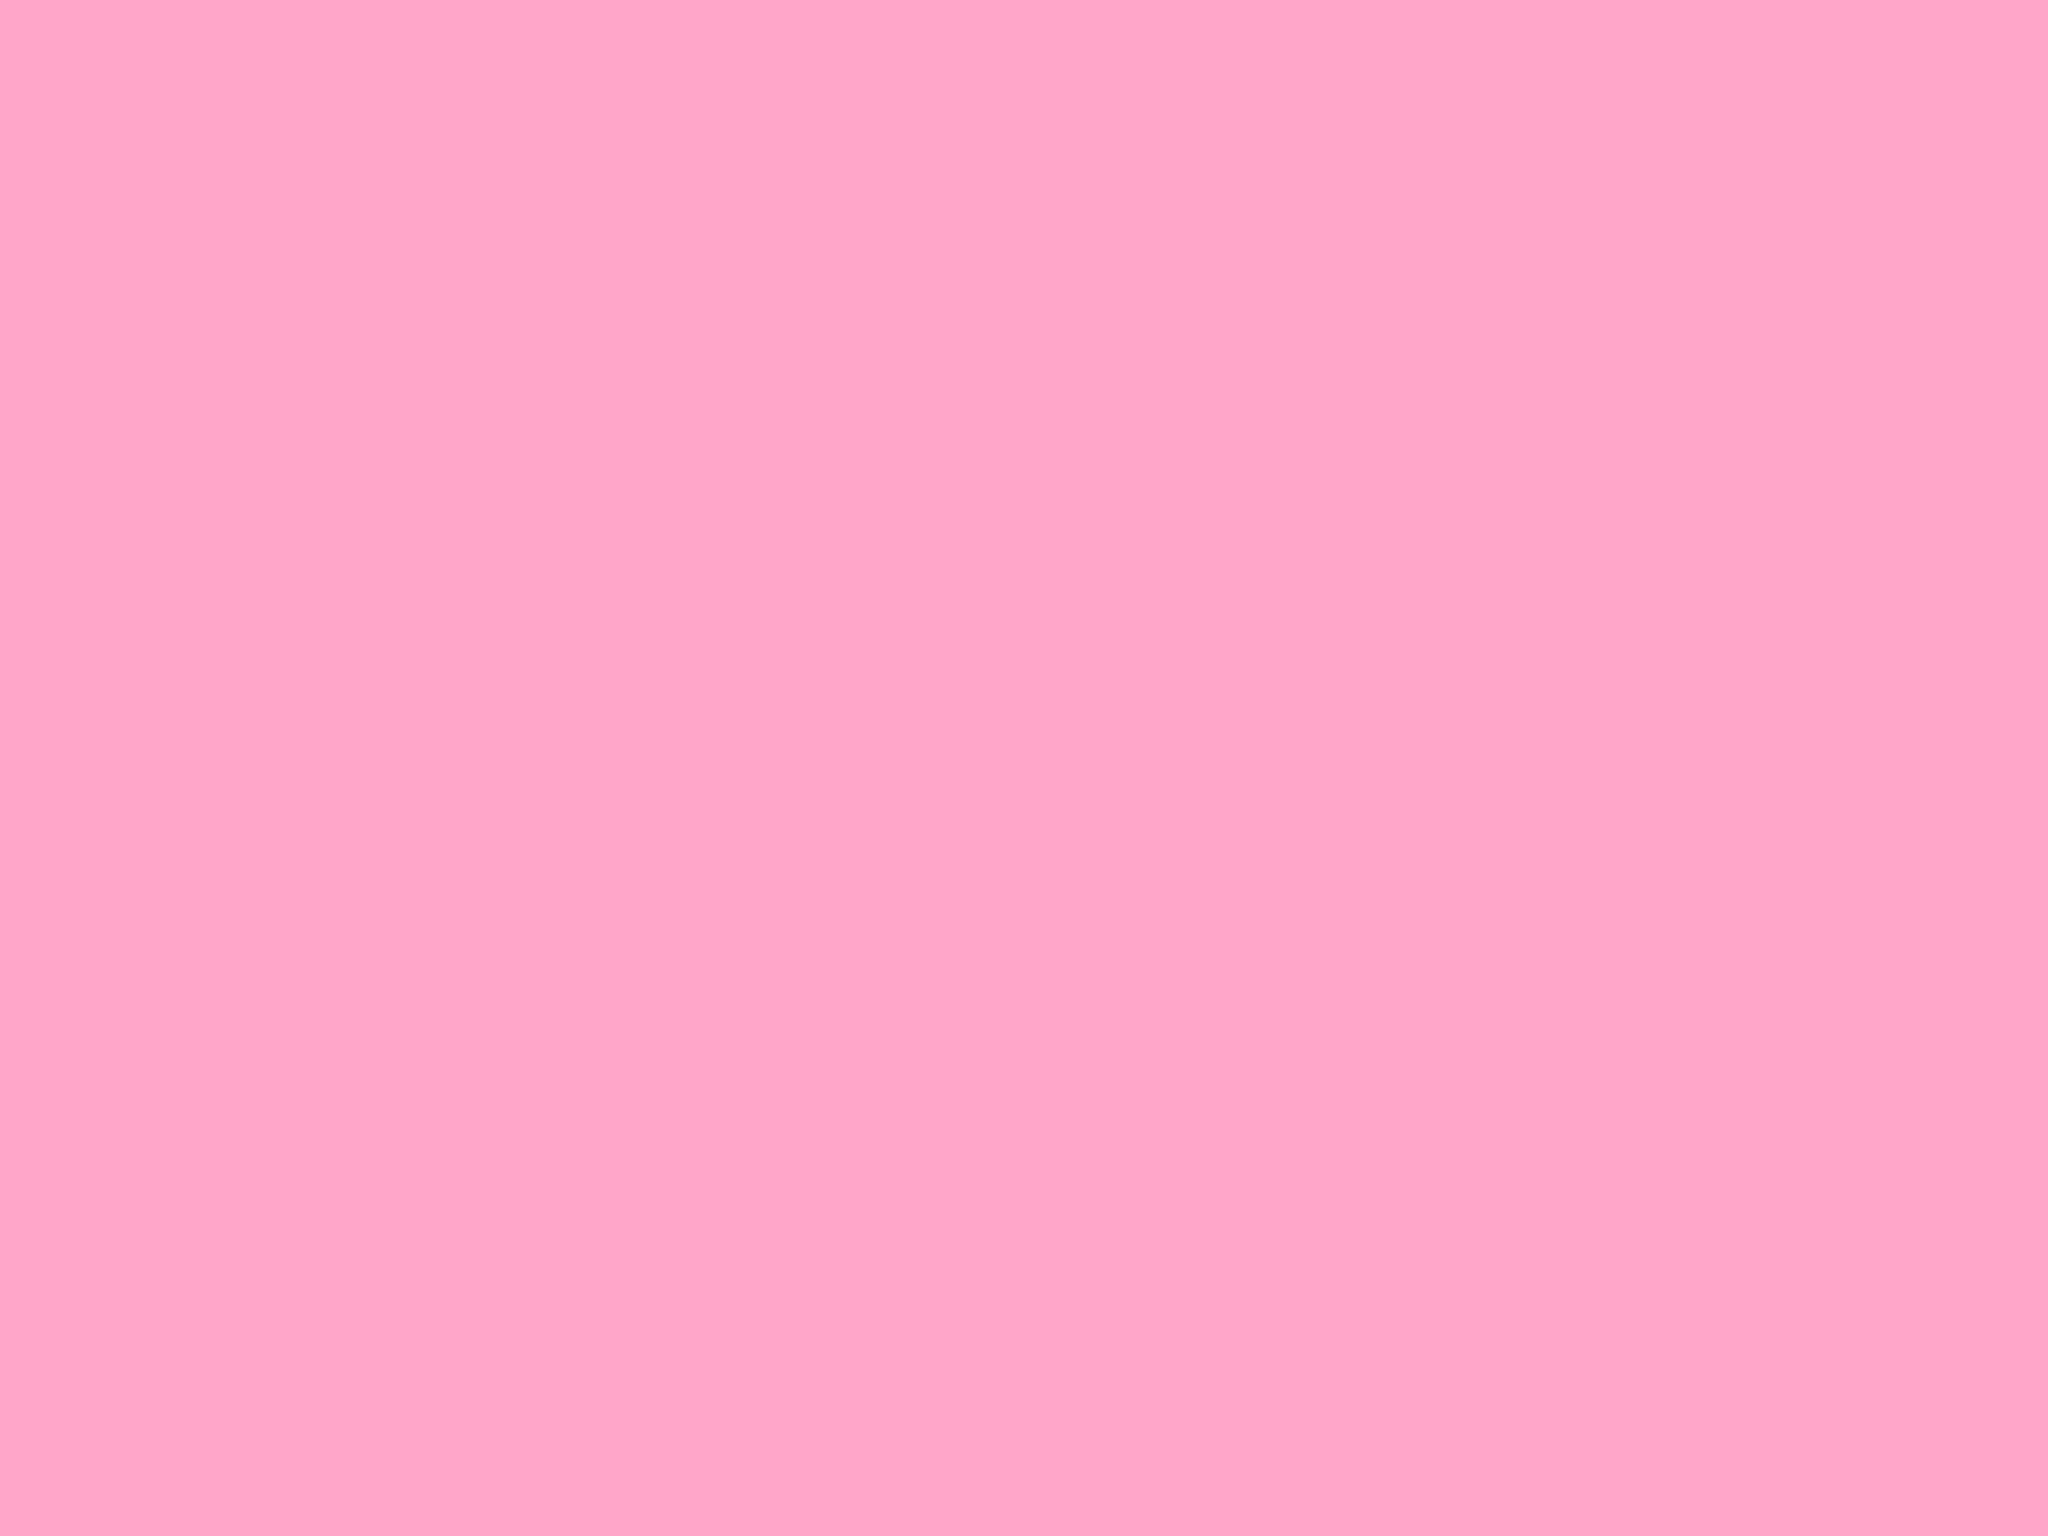 2048x1536 Carnation Pink Solid Color Background